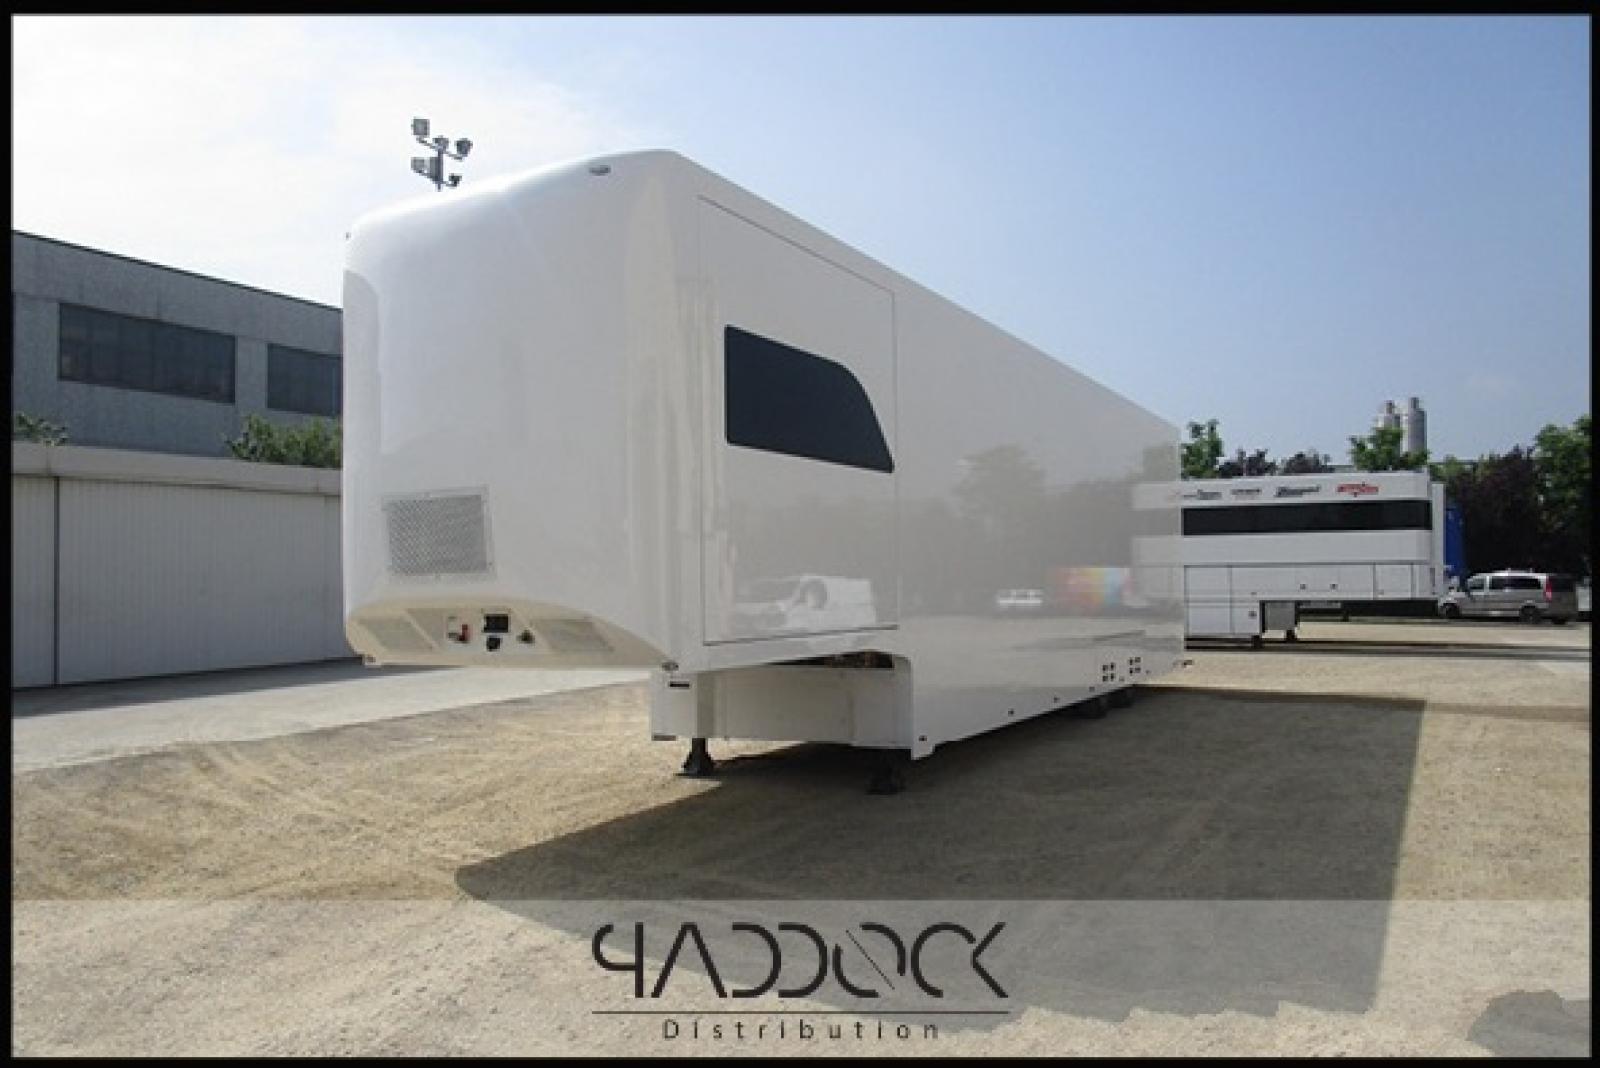 ASTA CAR Z3 SLIDE TRAILER BY PADDOCK DISTRIBUTION - 4